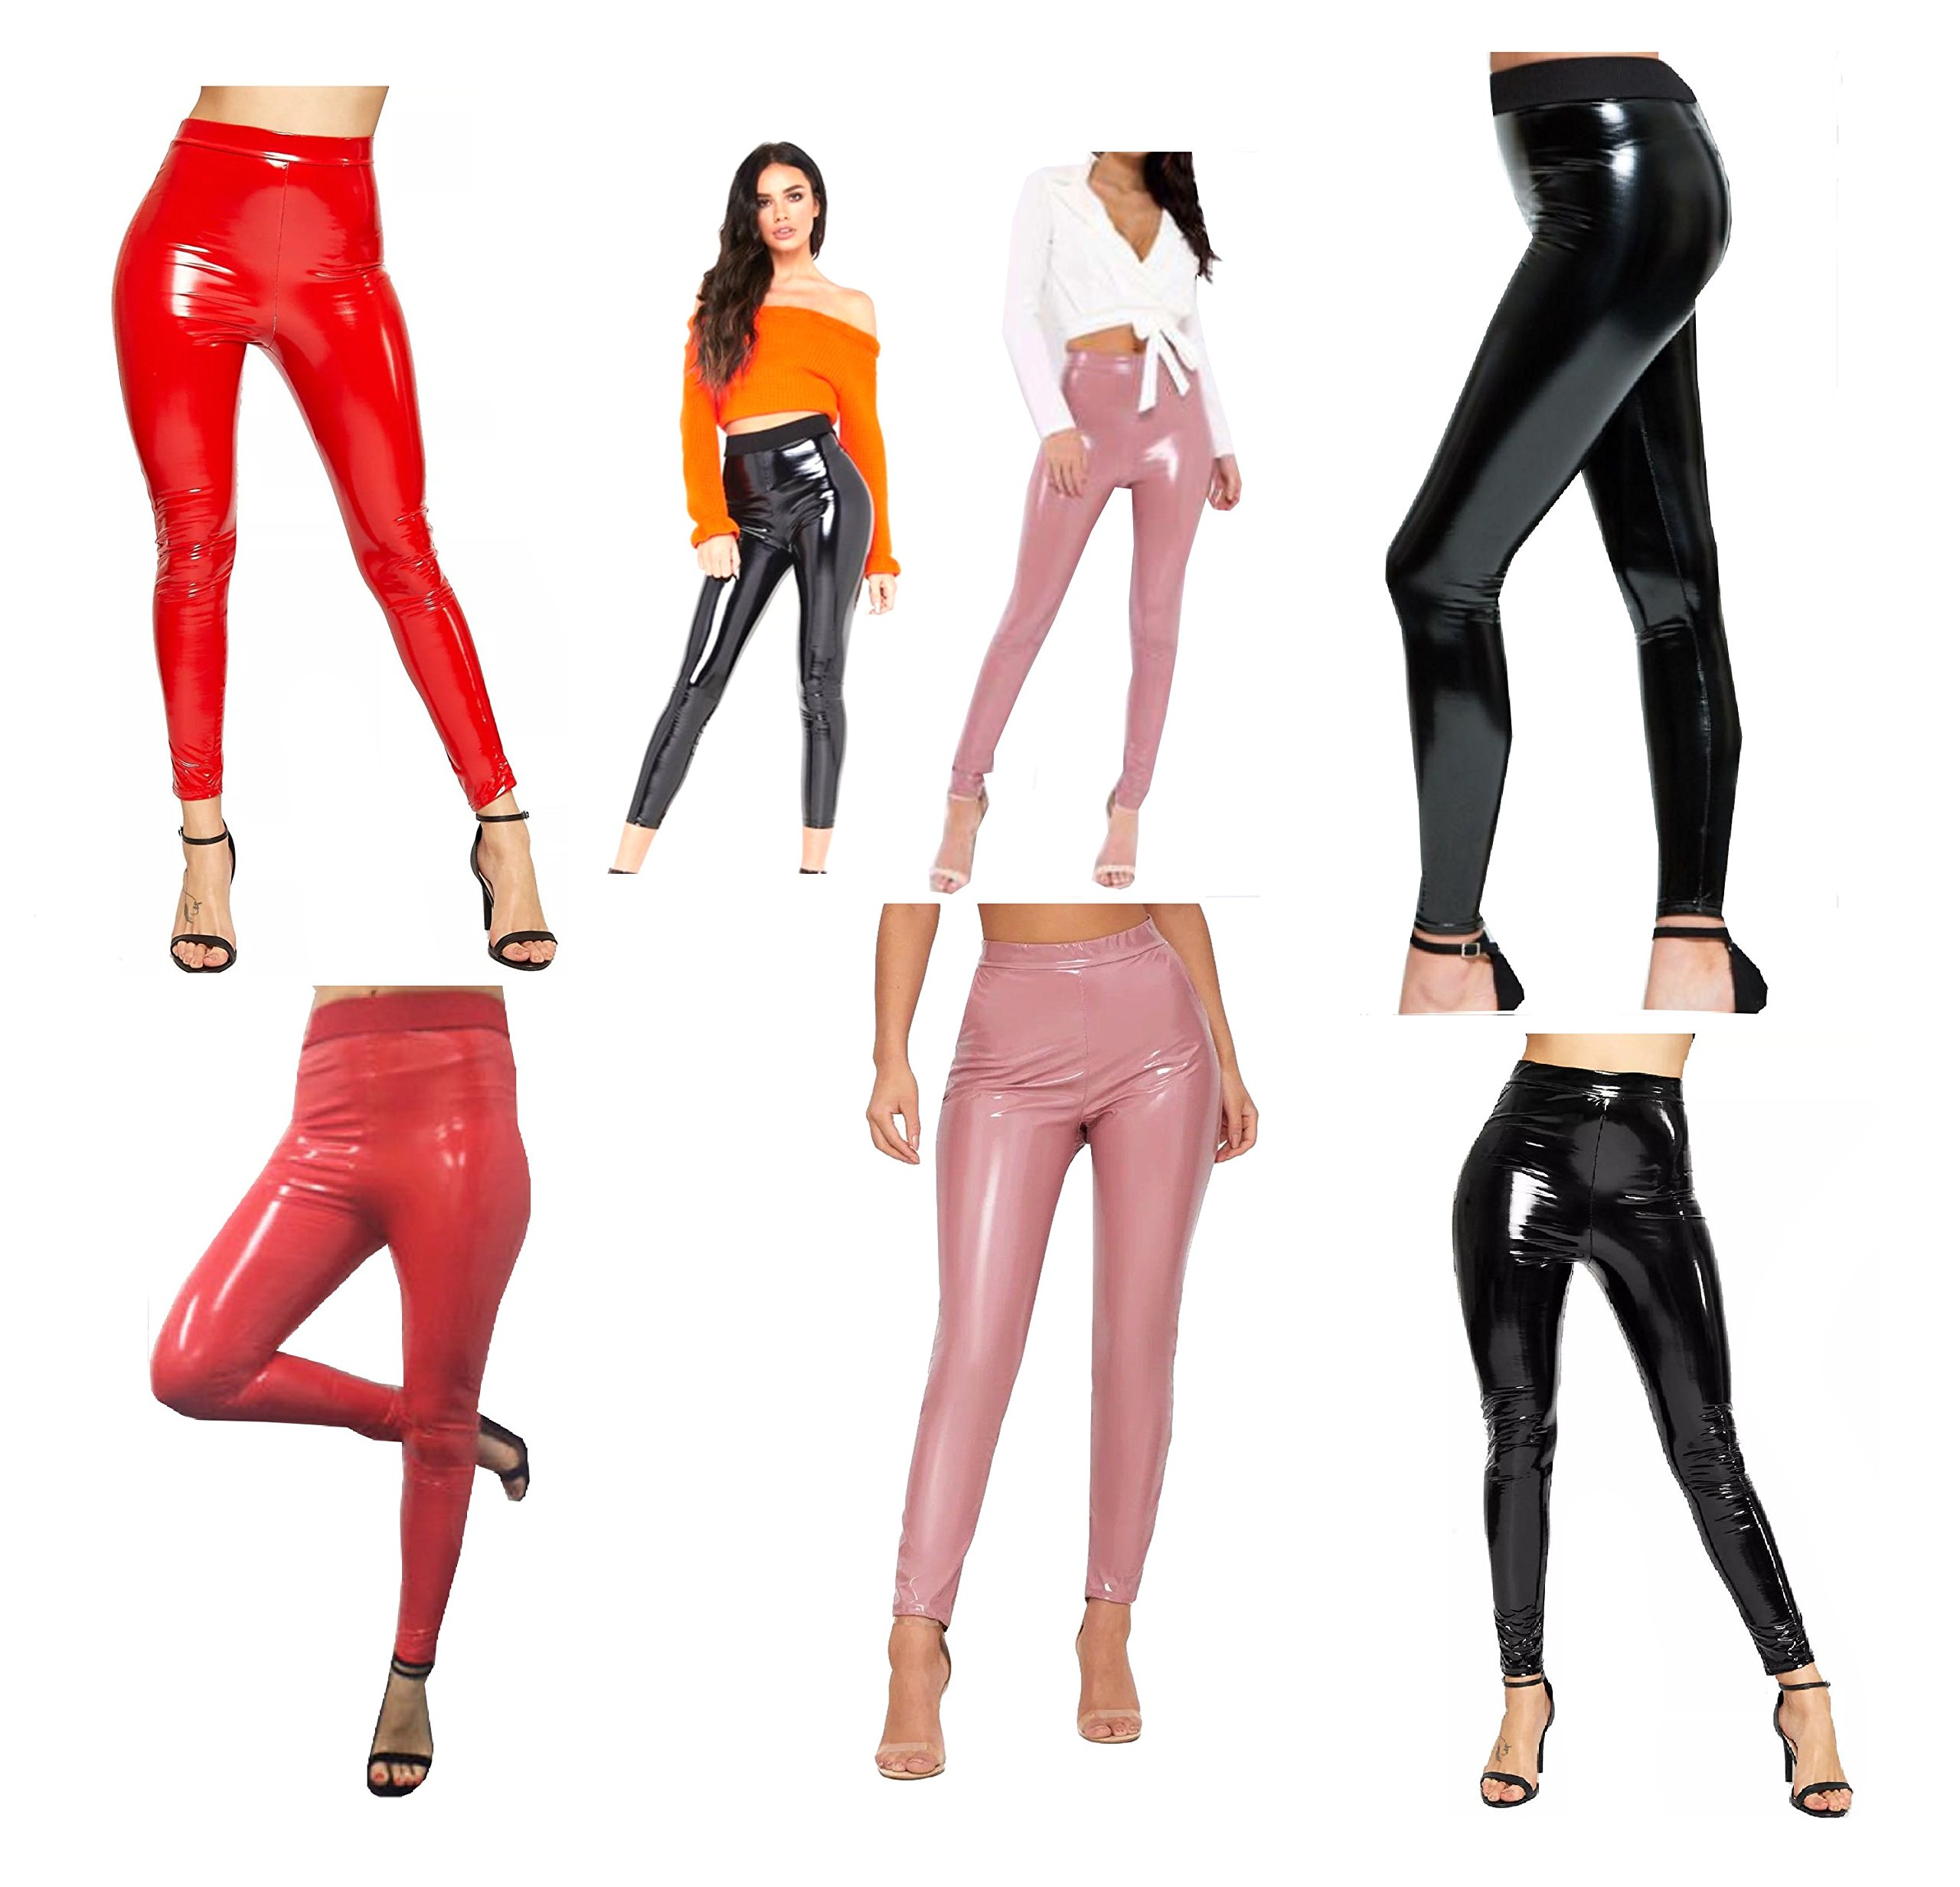 R KON Women Ladies Vinyl Wet Look Shiny PVC Disco High Waist Elasticated Leggings Pant 6-14